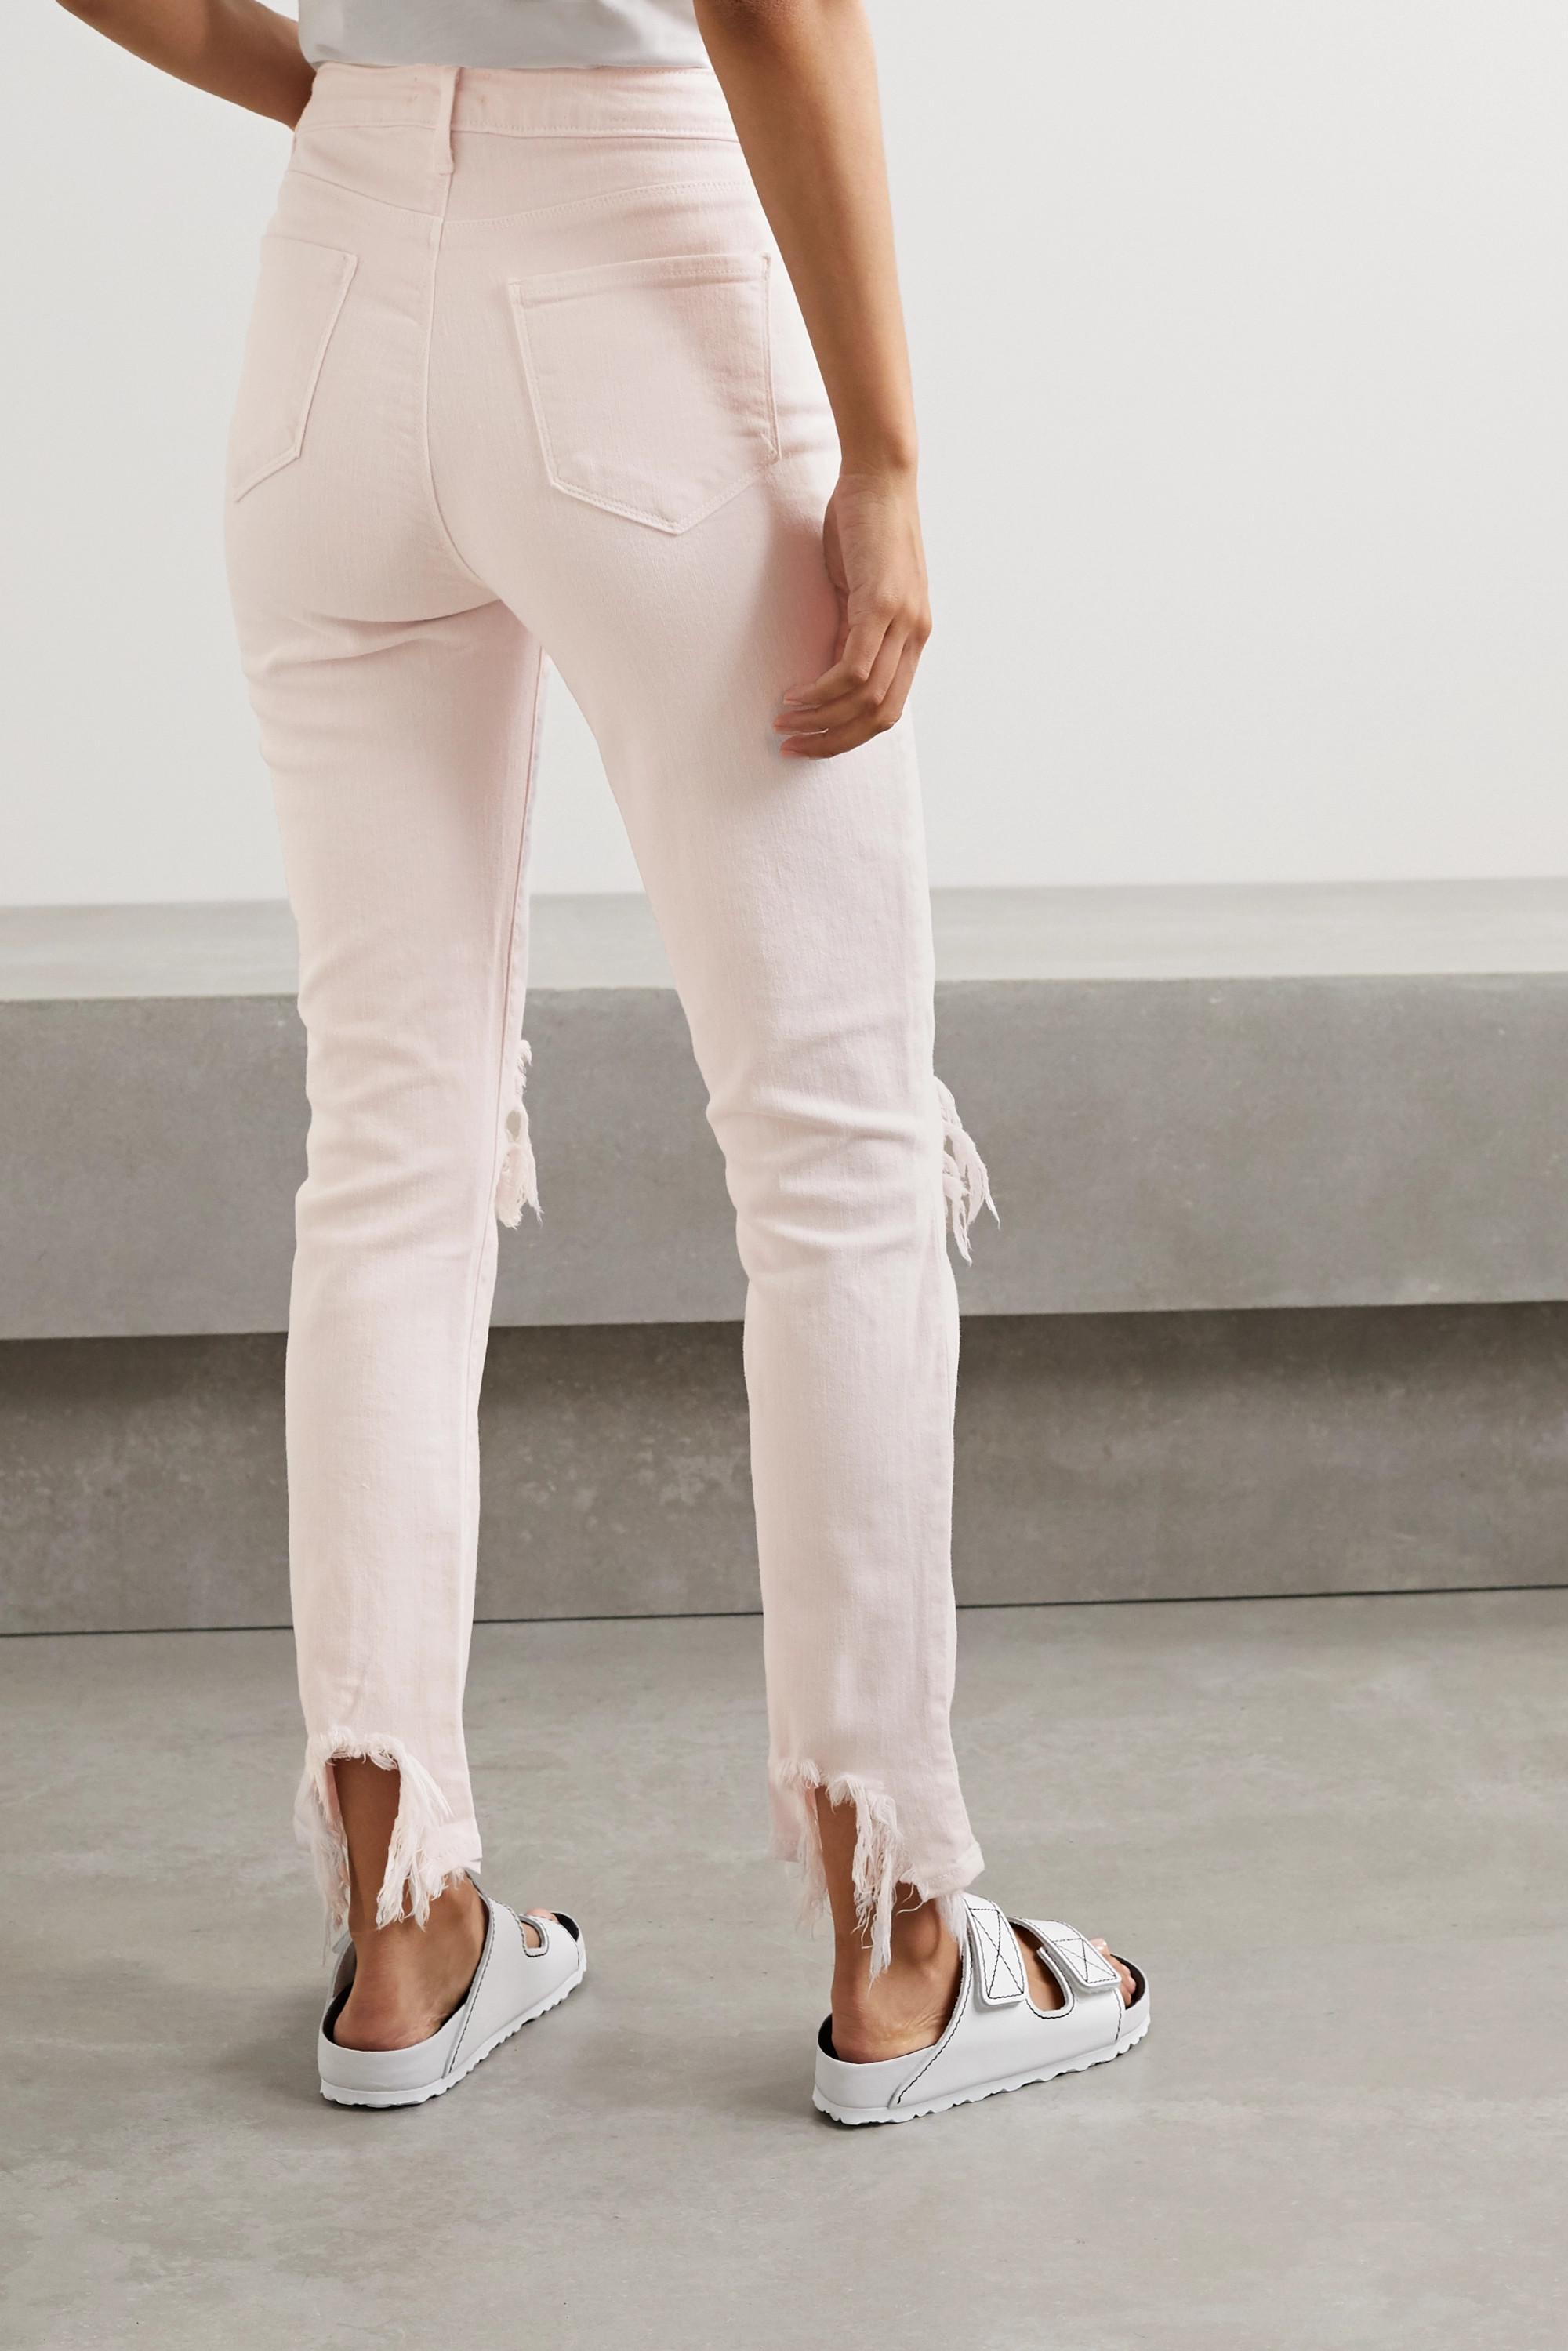 L'Agence High Line verkürzte, hoch sitzende Skinny Jeans in Distressed-Optik